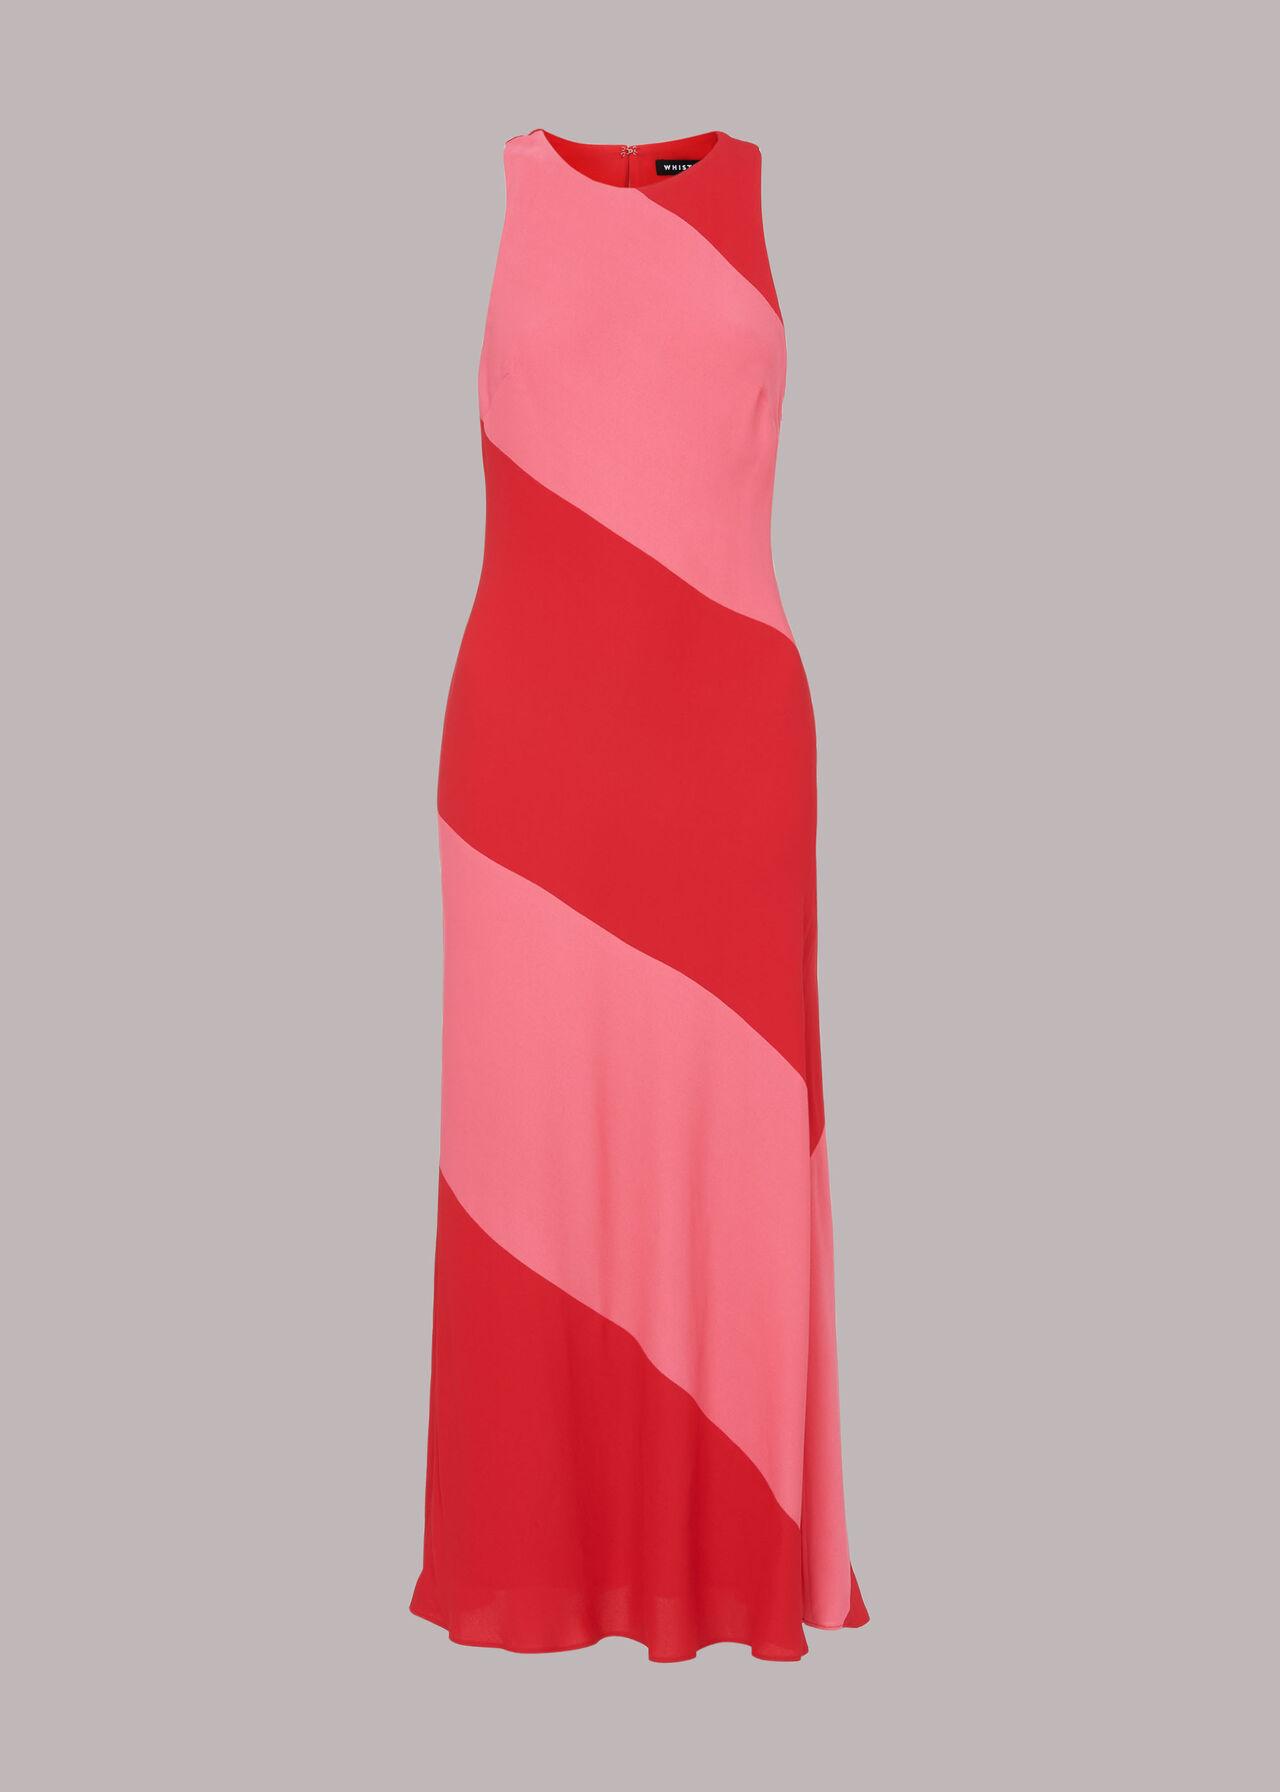 Poppy Panelled Dress